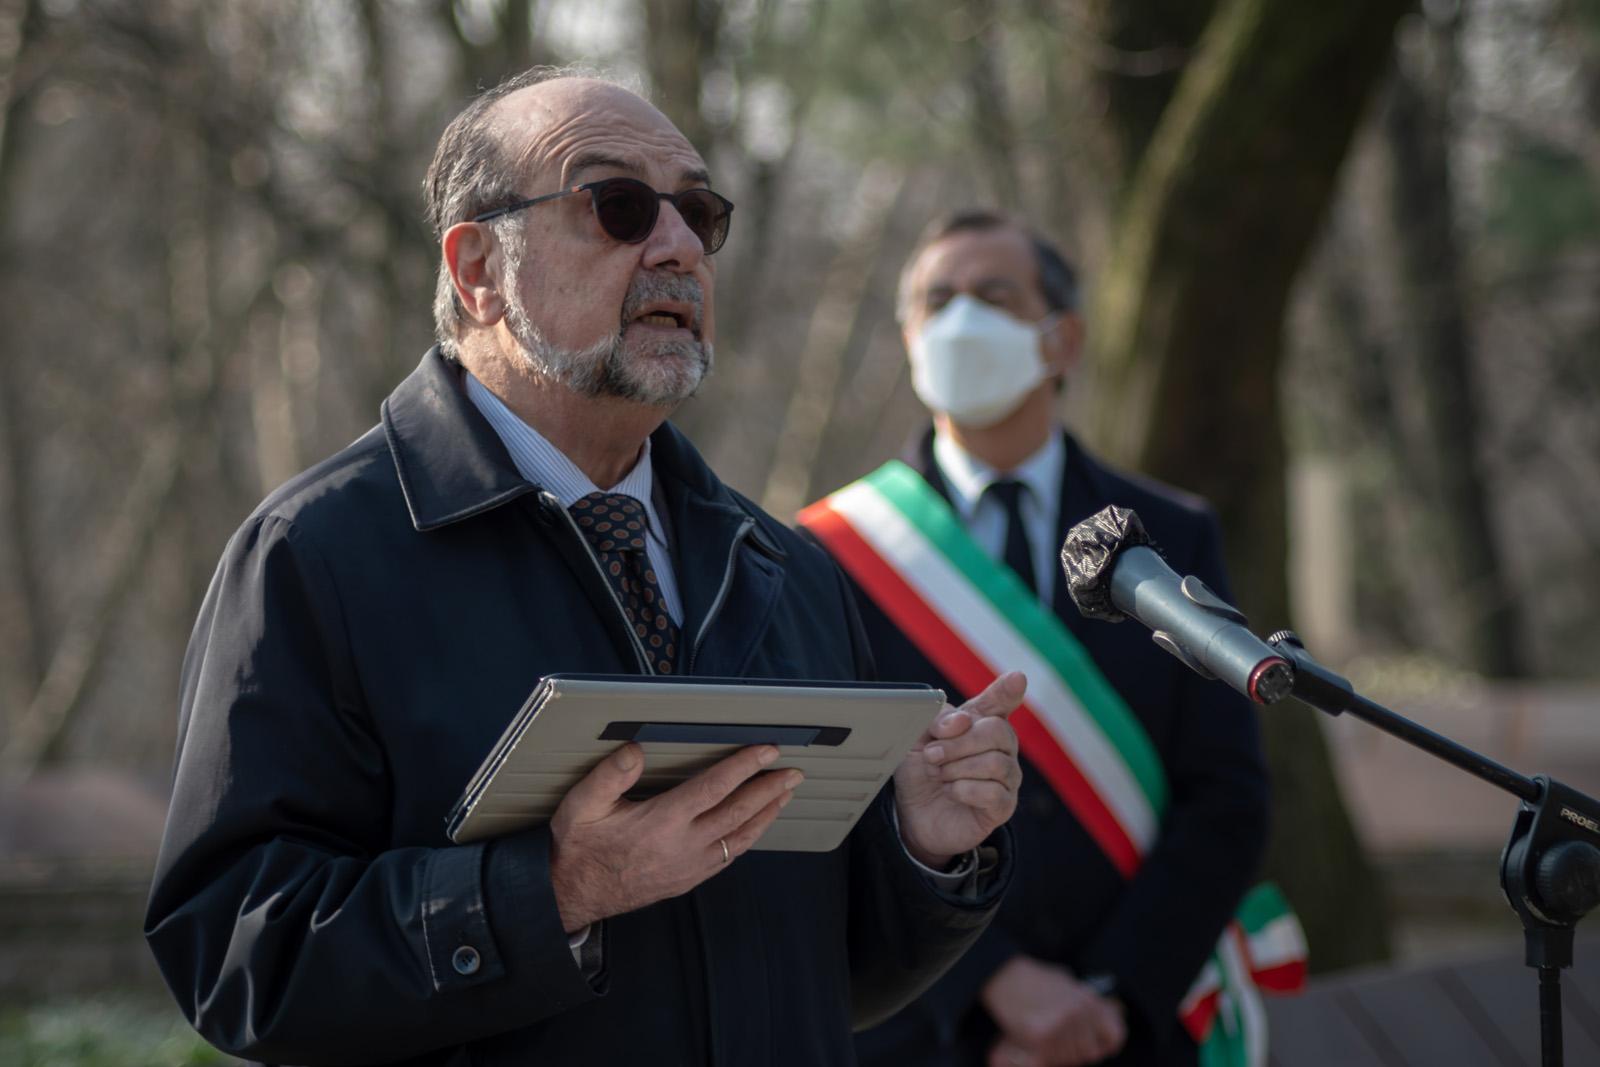 The speech by UCEI Vice President Giorgio Mortara